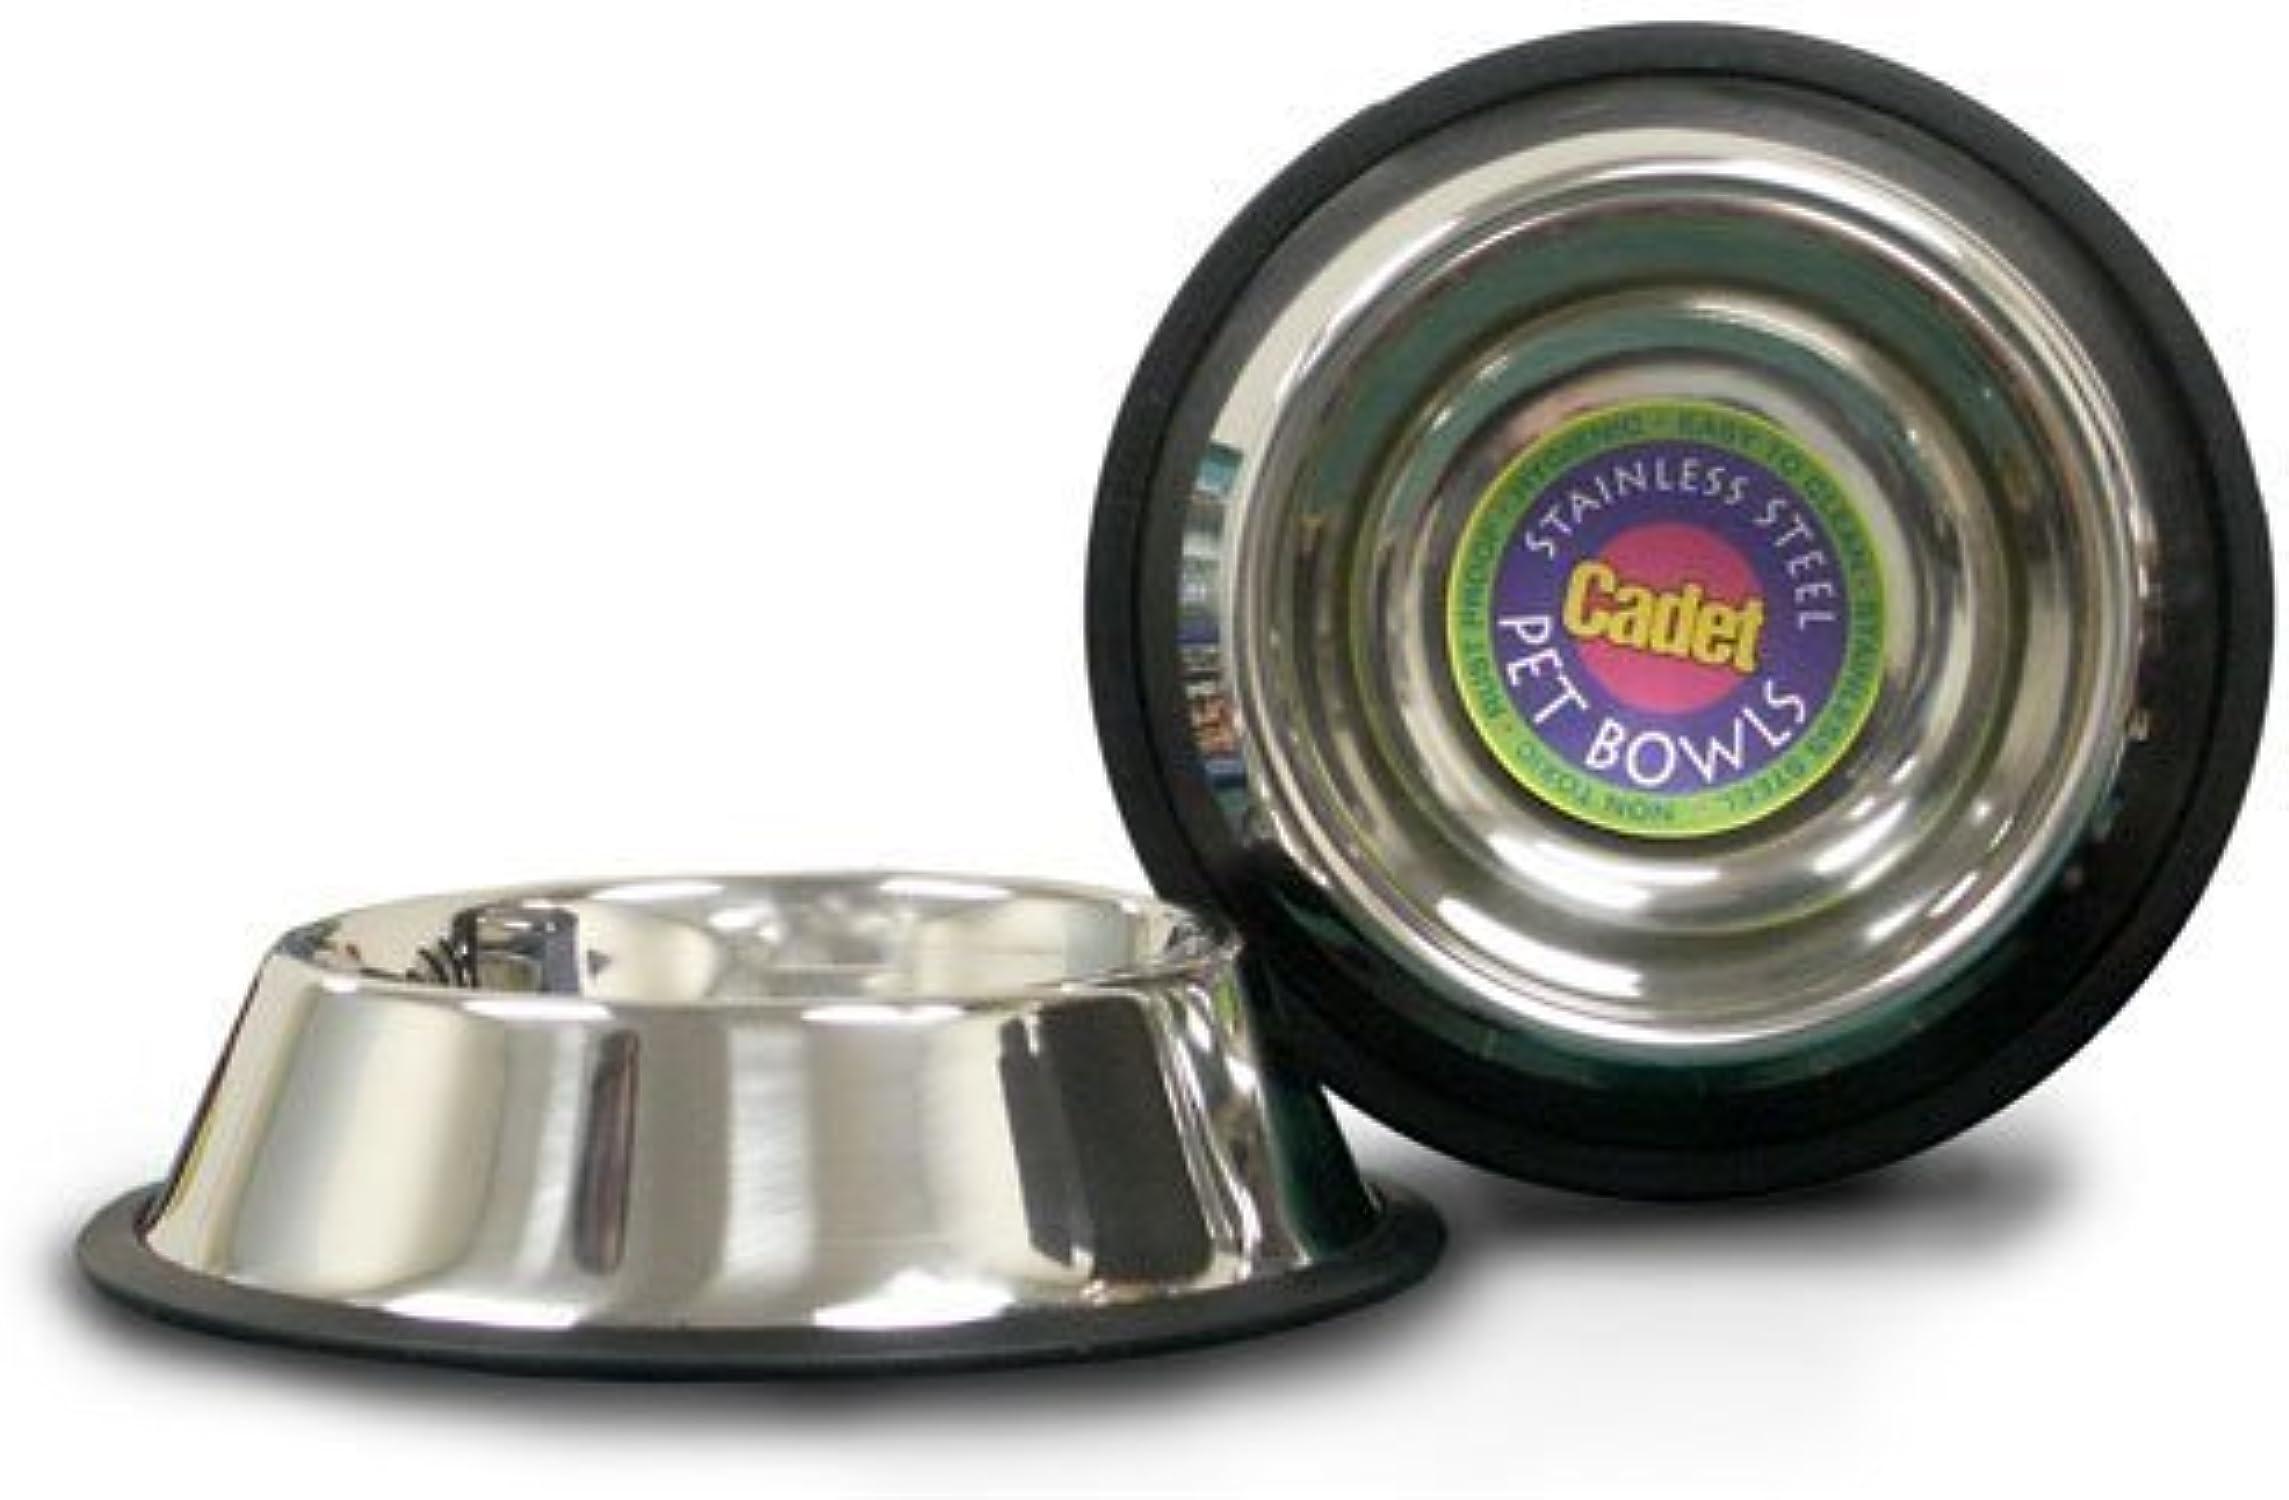 entrega de rayos IMS Non-Spill Mirrorojo Bowl, 16-ounce by Top Dog Treats Treats Treats and Chews  calidad auténtica